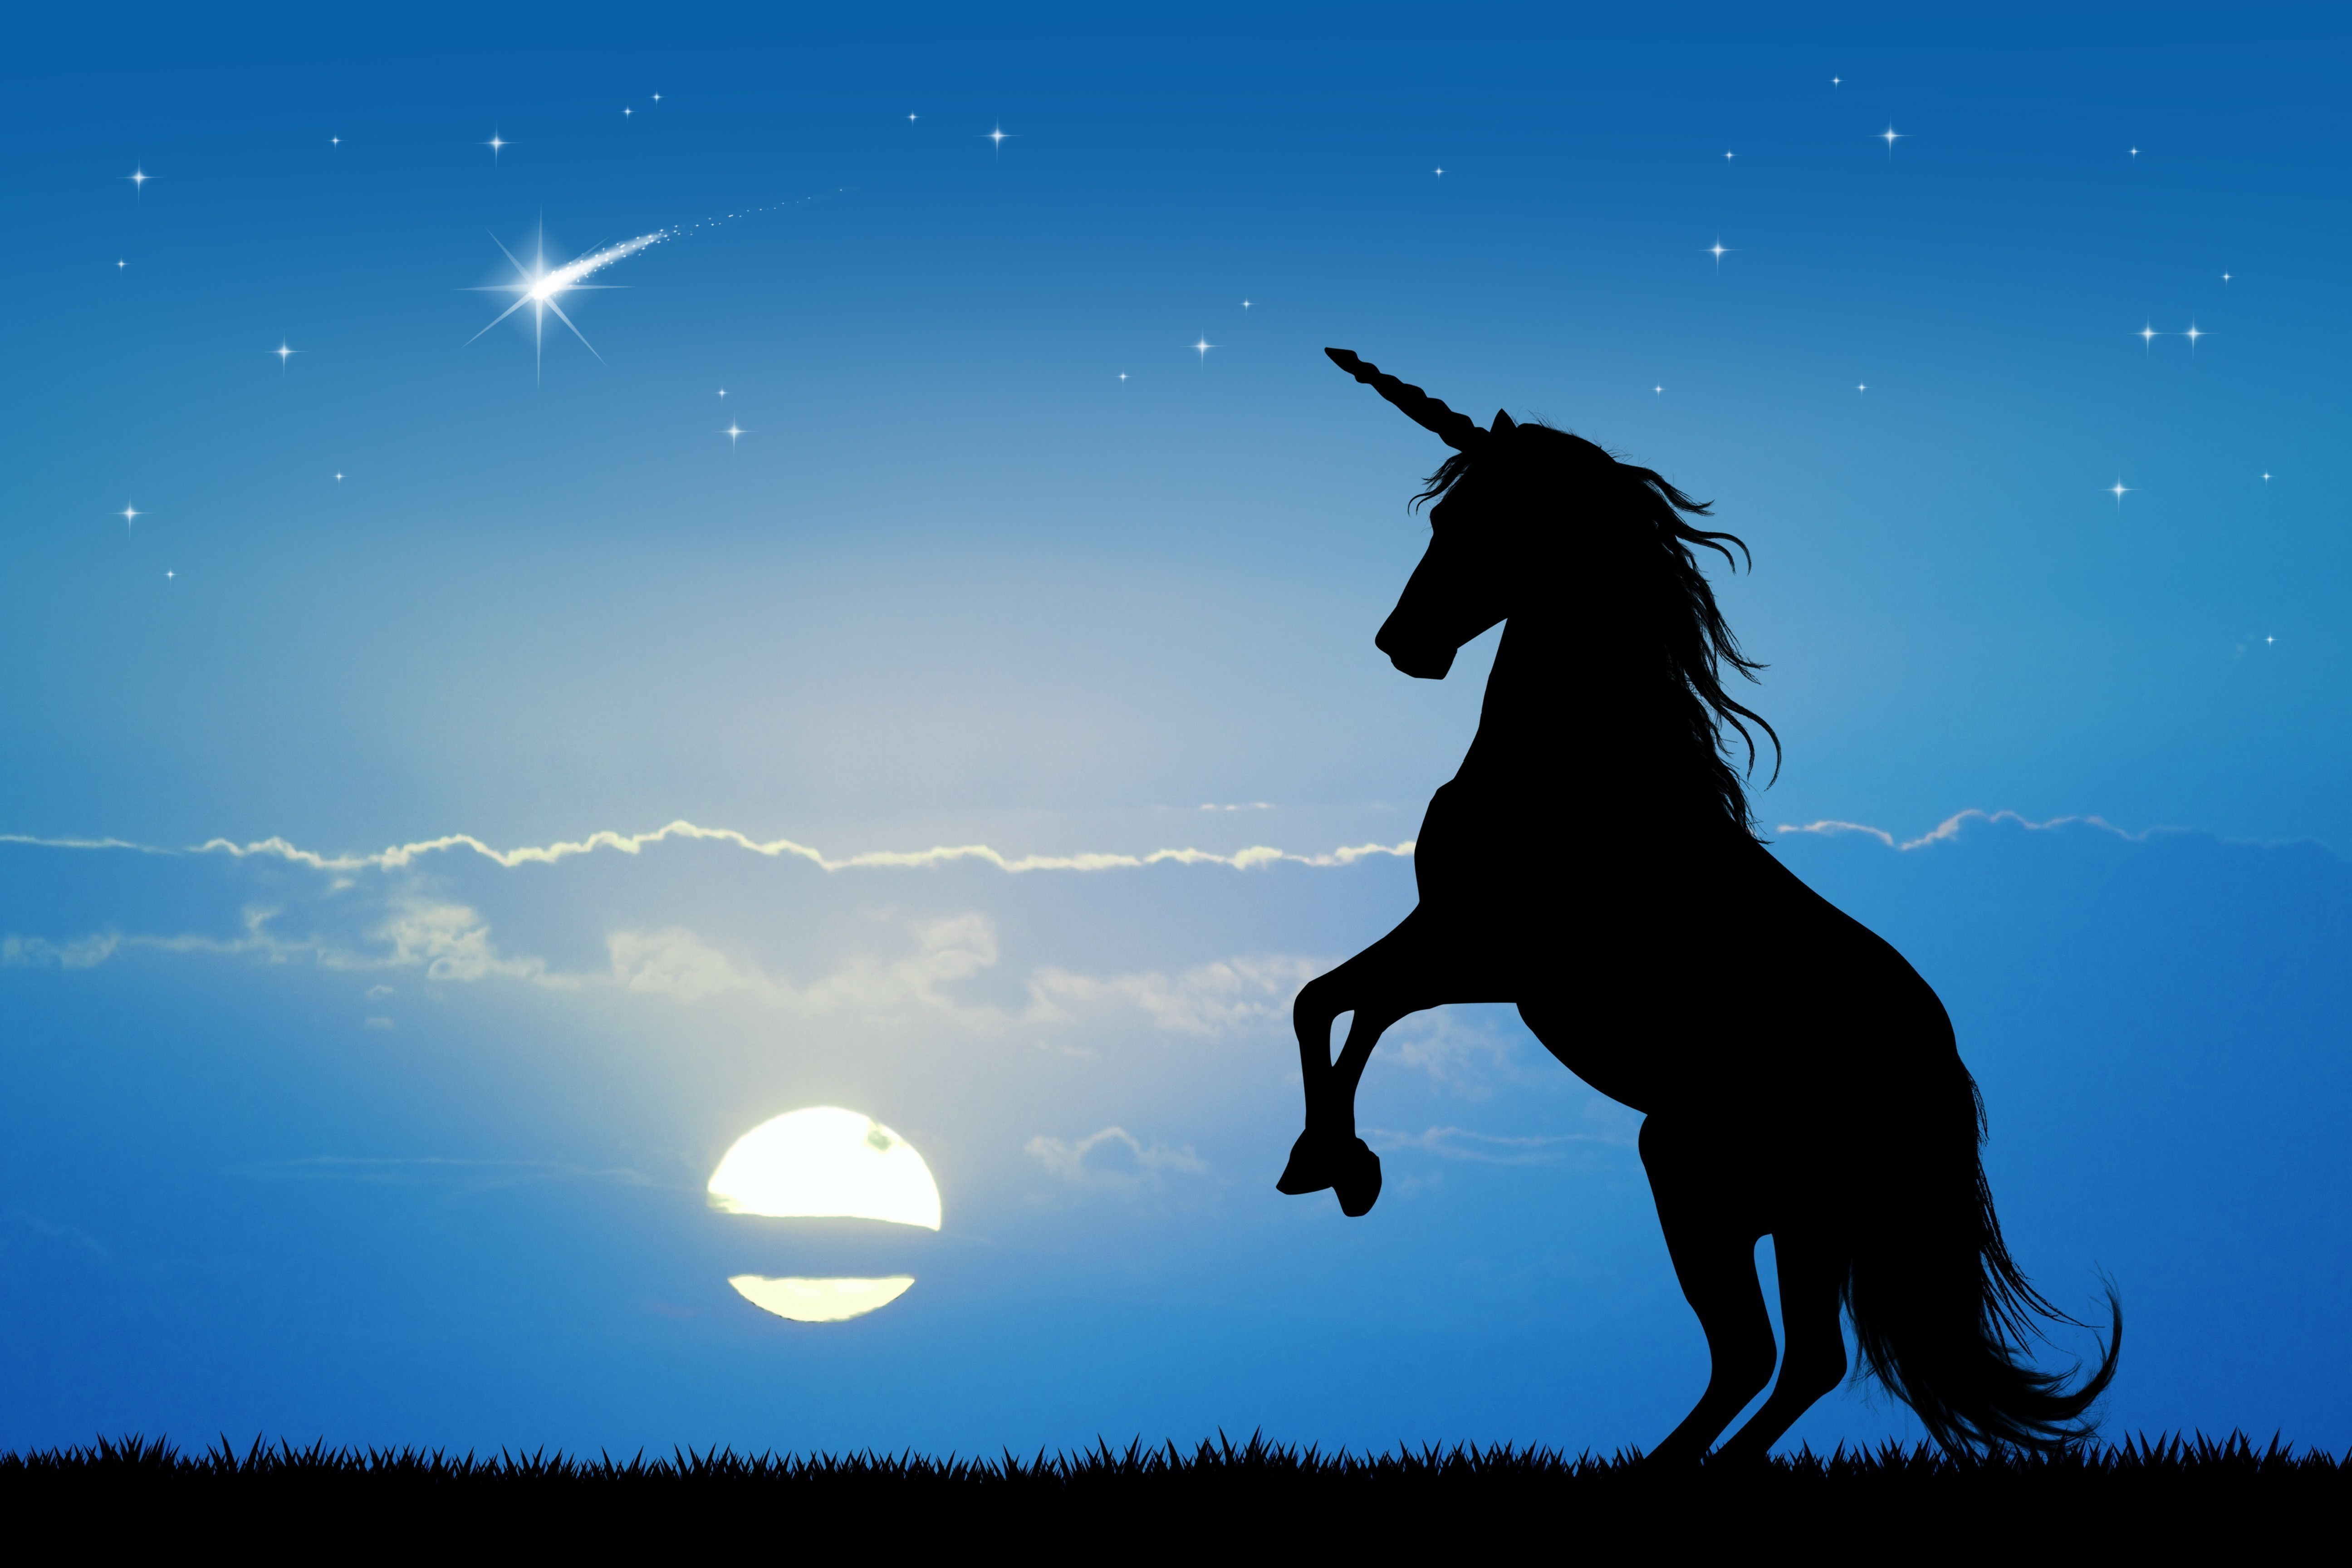 Simple Blue Prints >> Unicorn at sunset - Fantasy - Categories - Canvas Prints | Wonder Wall